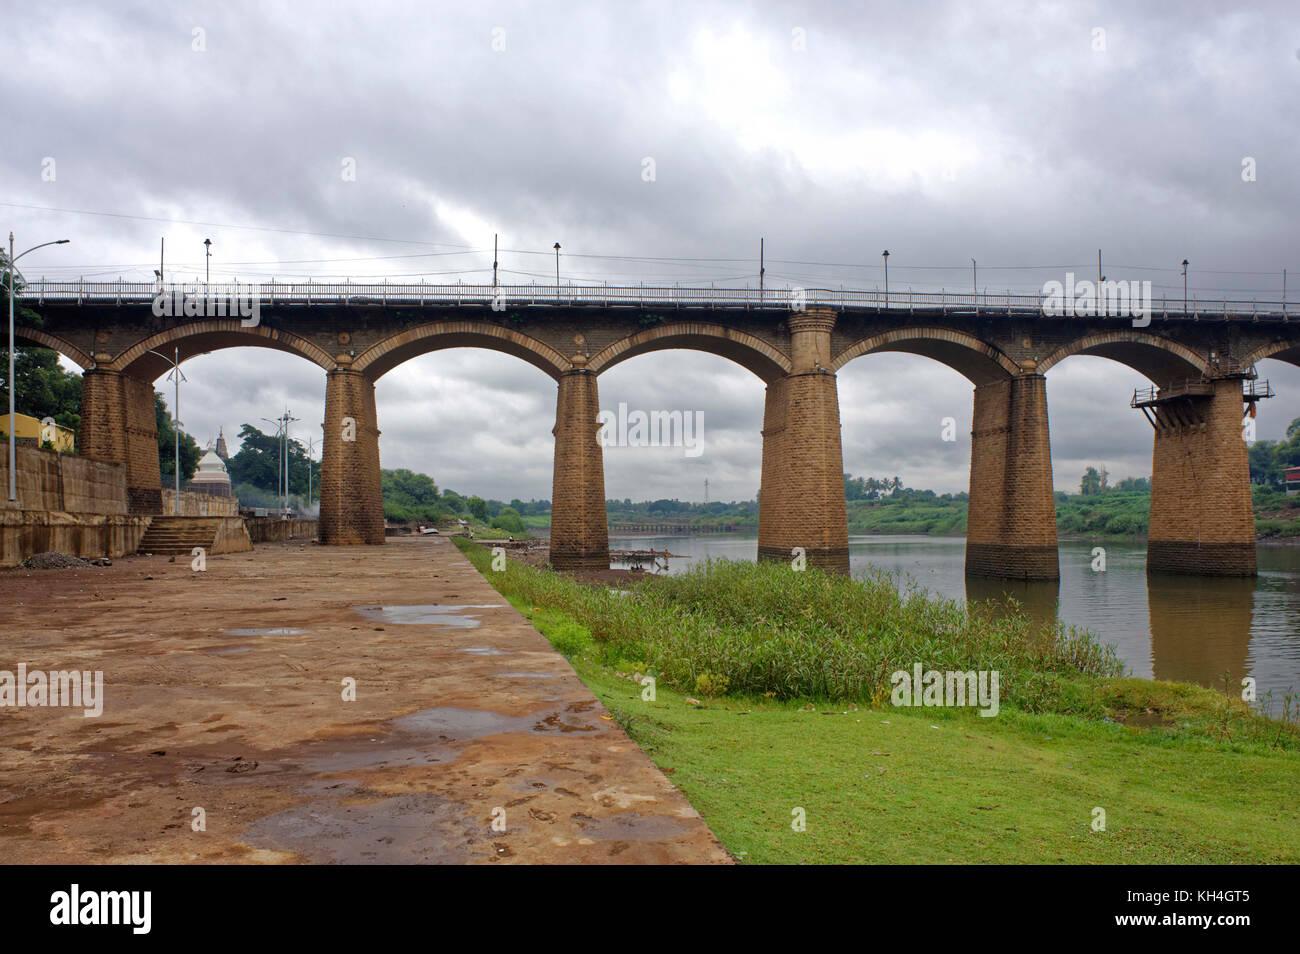 Irwin Brücke auf Krishna Fluss, Sangli, Maharashtra, Indien, Asien Stockbild